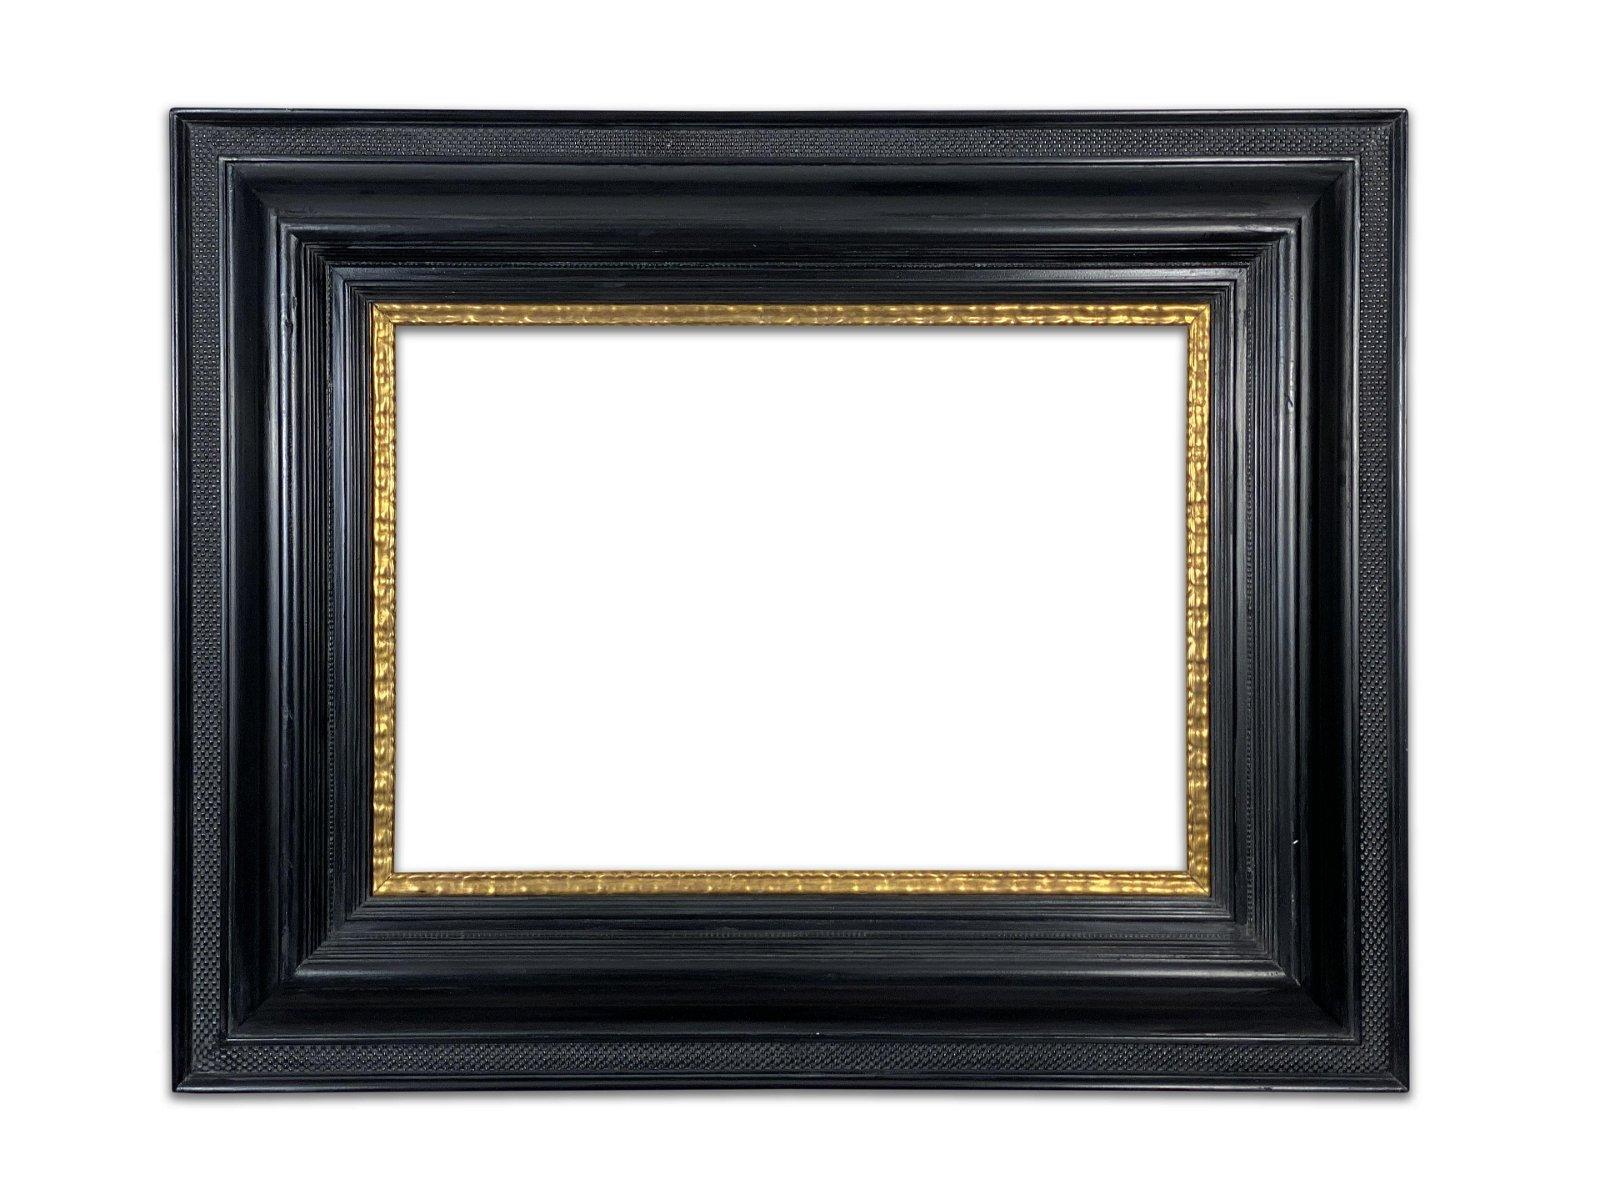 Eli Wilner Frame, 19th c. Dutch Style Ex. Picasso